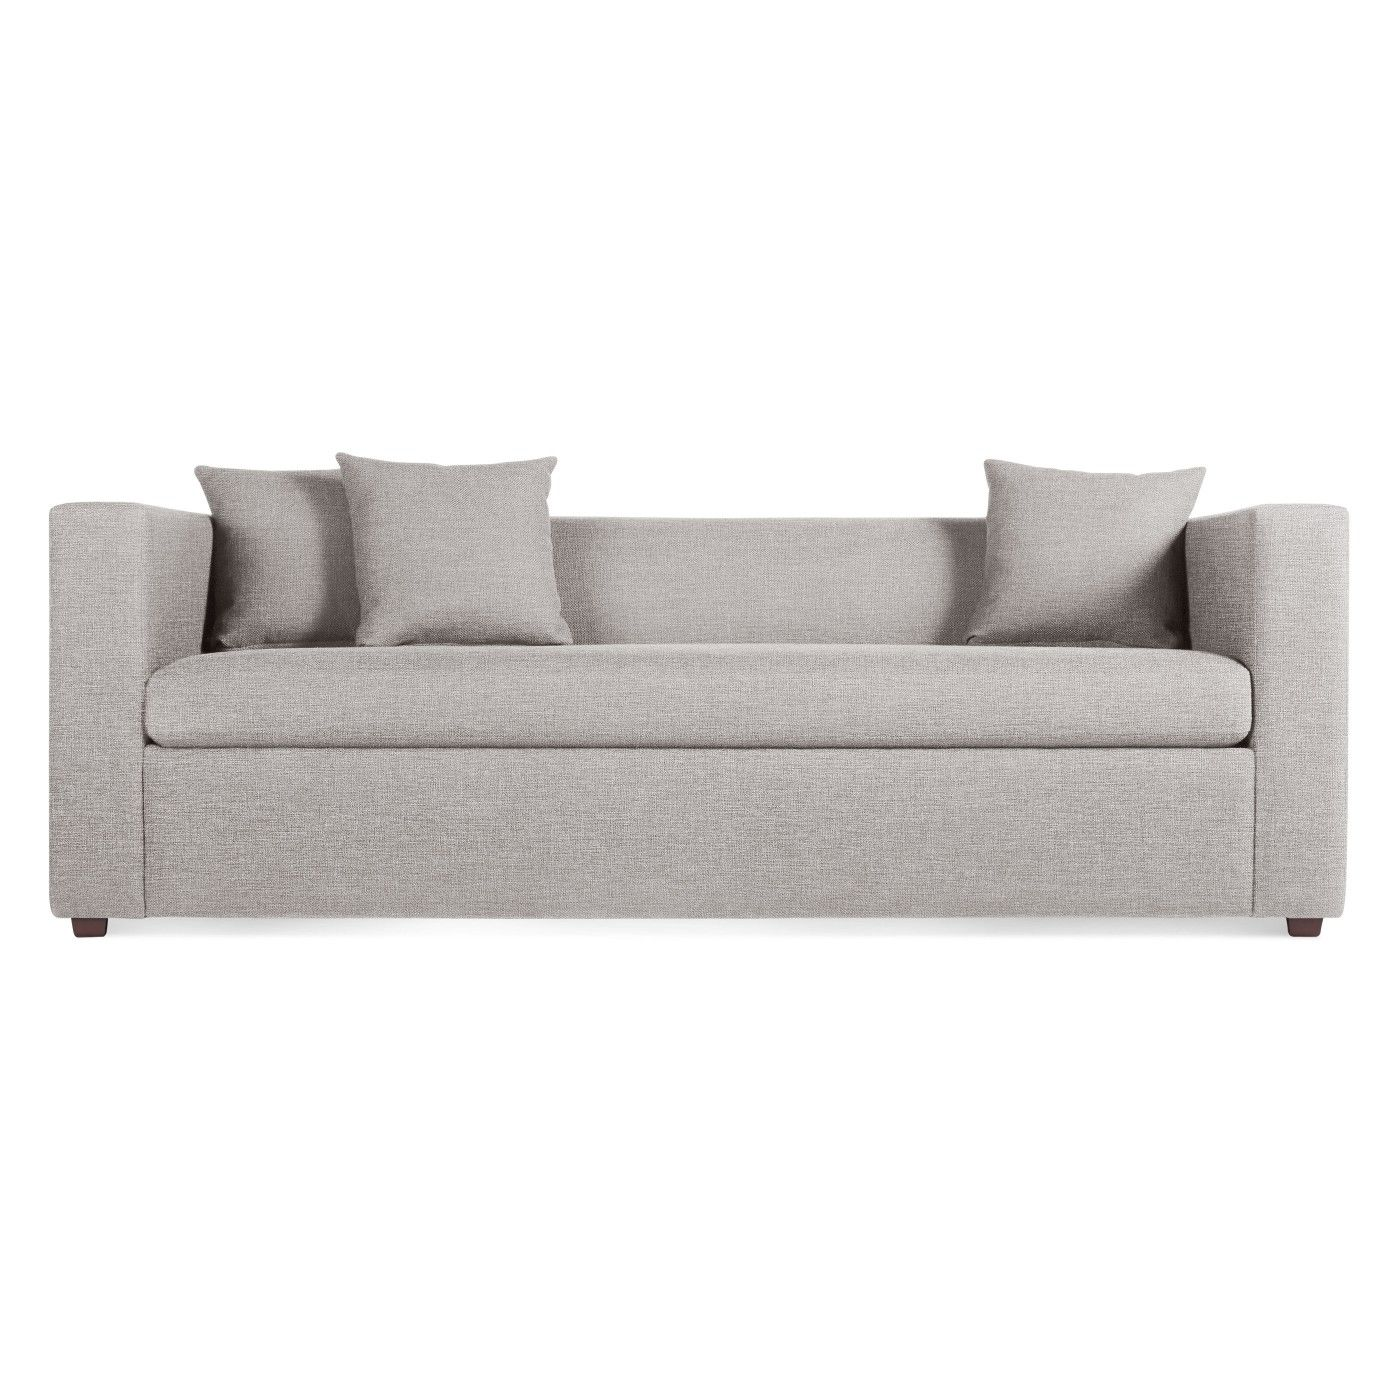 Mono Sleeper Sofa Spitzer Grey Chris nyc Pinterest